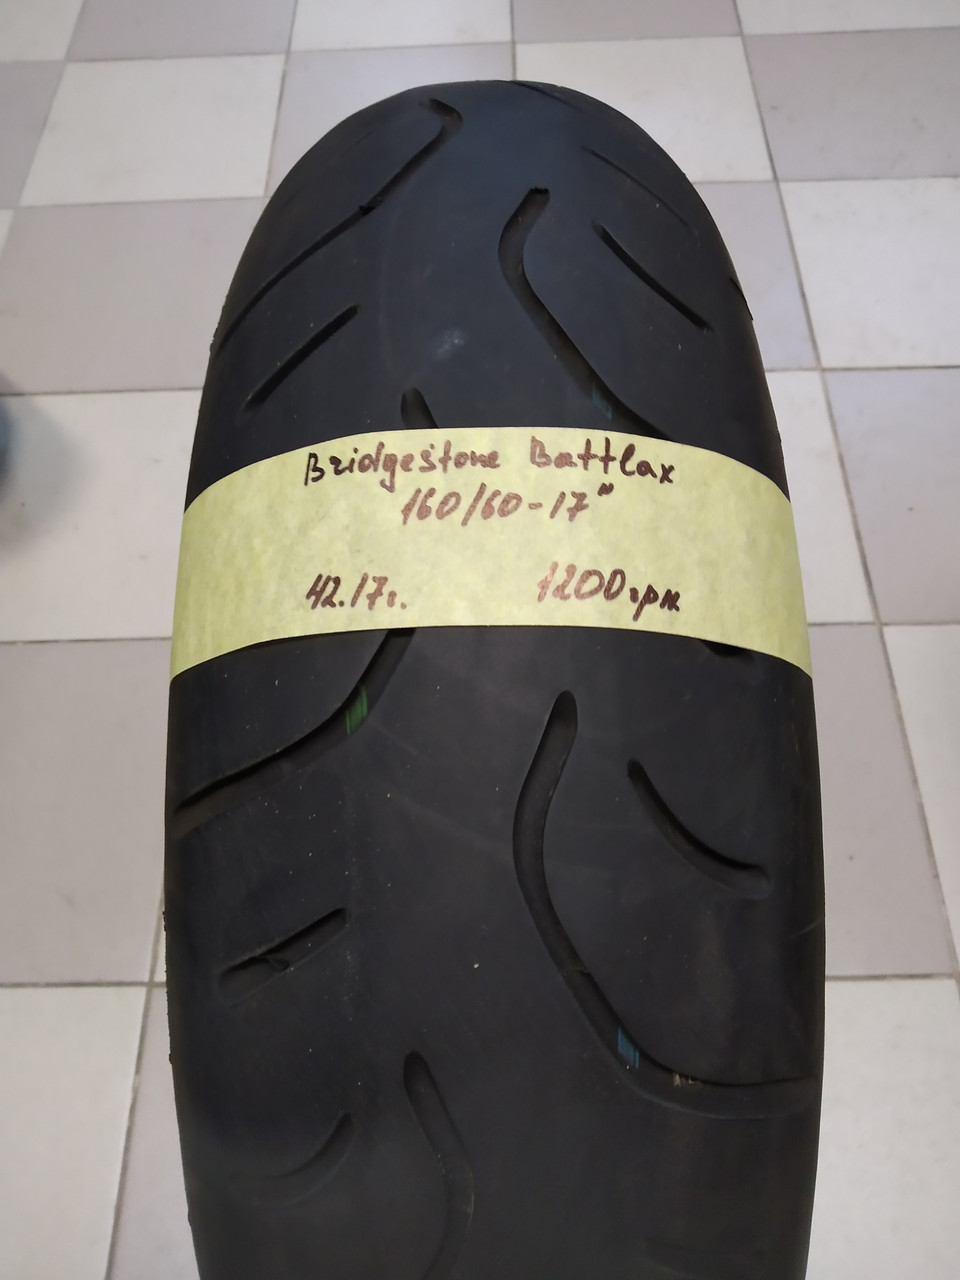 Bridgestone Battlax 160 60 17  (42.17) Моторезина шина колесо  покрышка